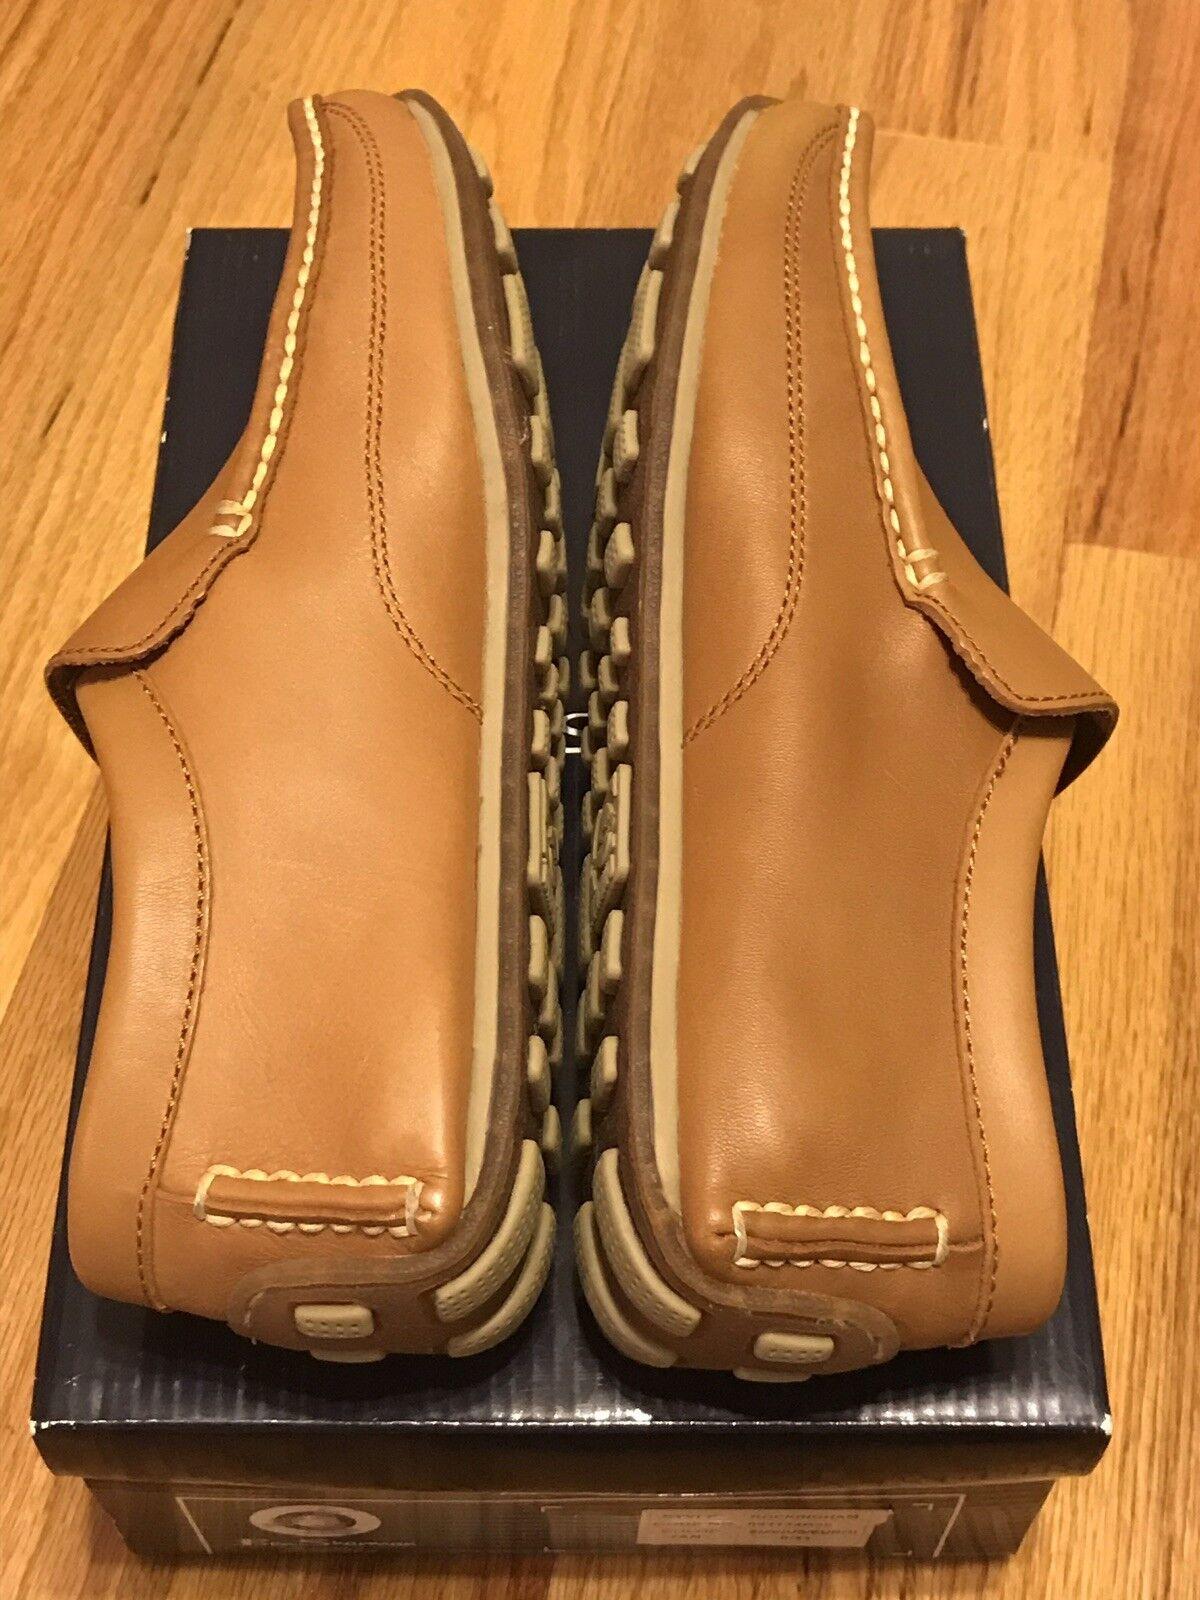 c51bddb1d031fb ... Ben Sherman Rockingham Loafers Tan Men s size US 8 8 8 style 081134B30  PERFECT 82aa26 ...